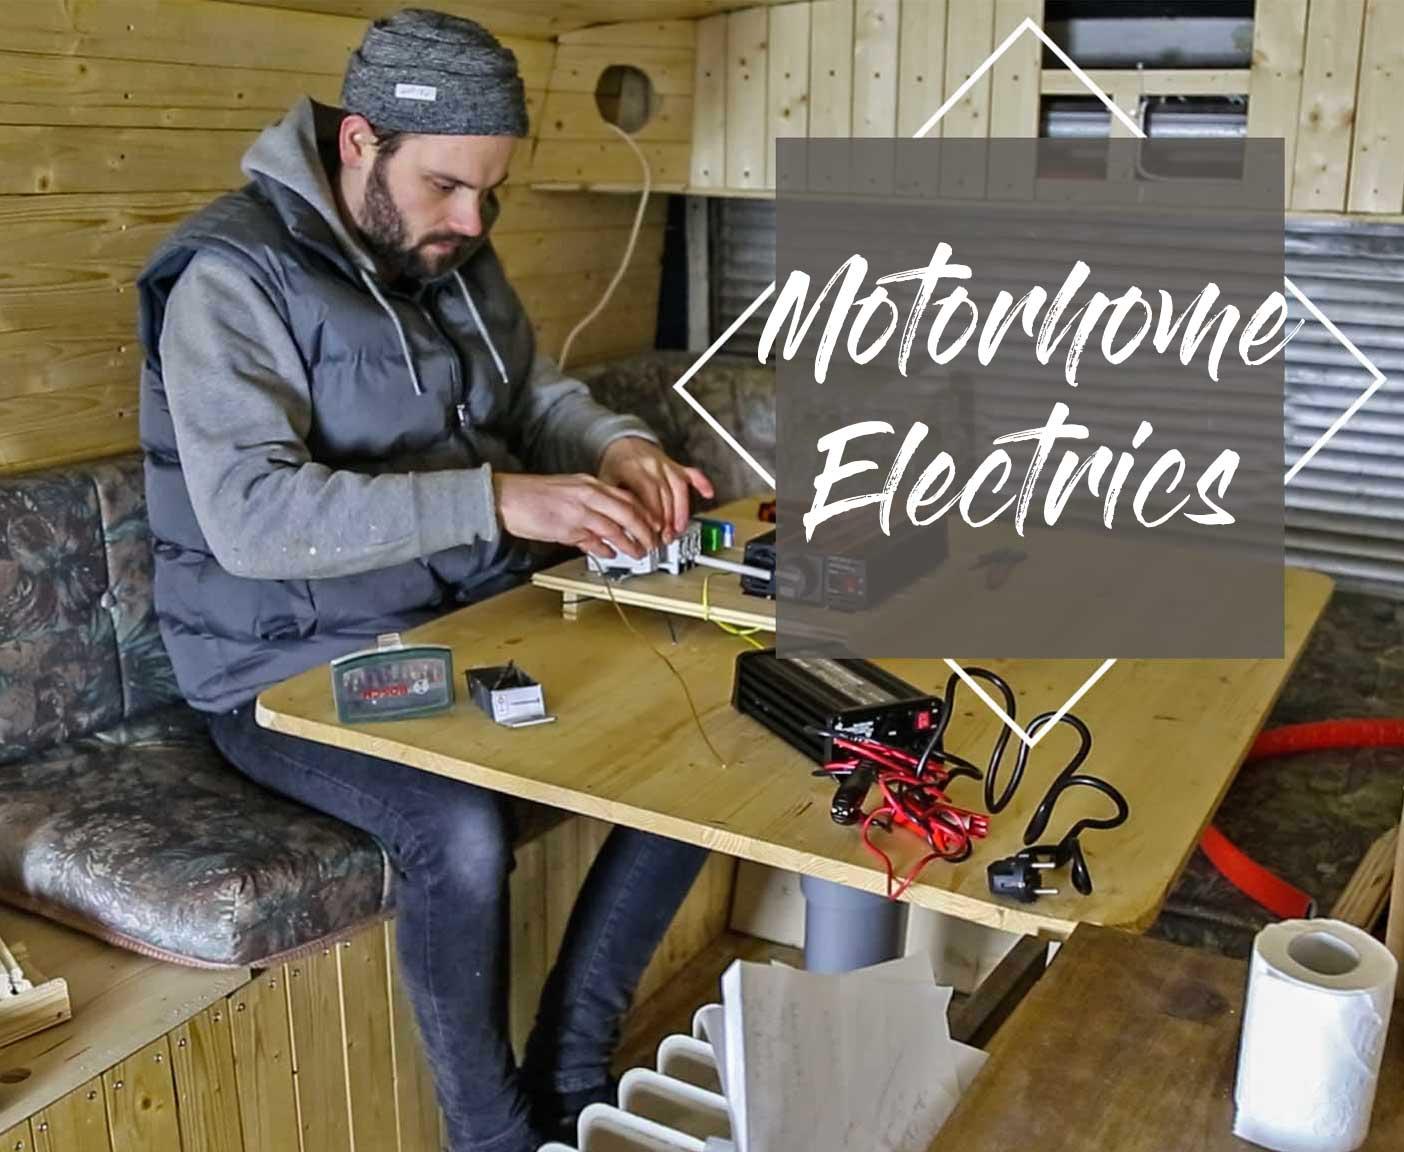 motorhome-electrics-beginners-guide